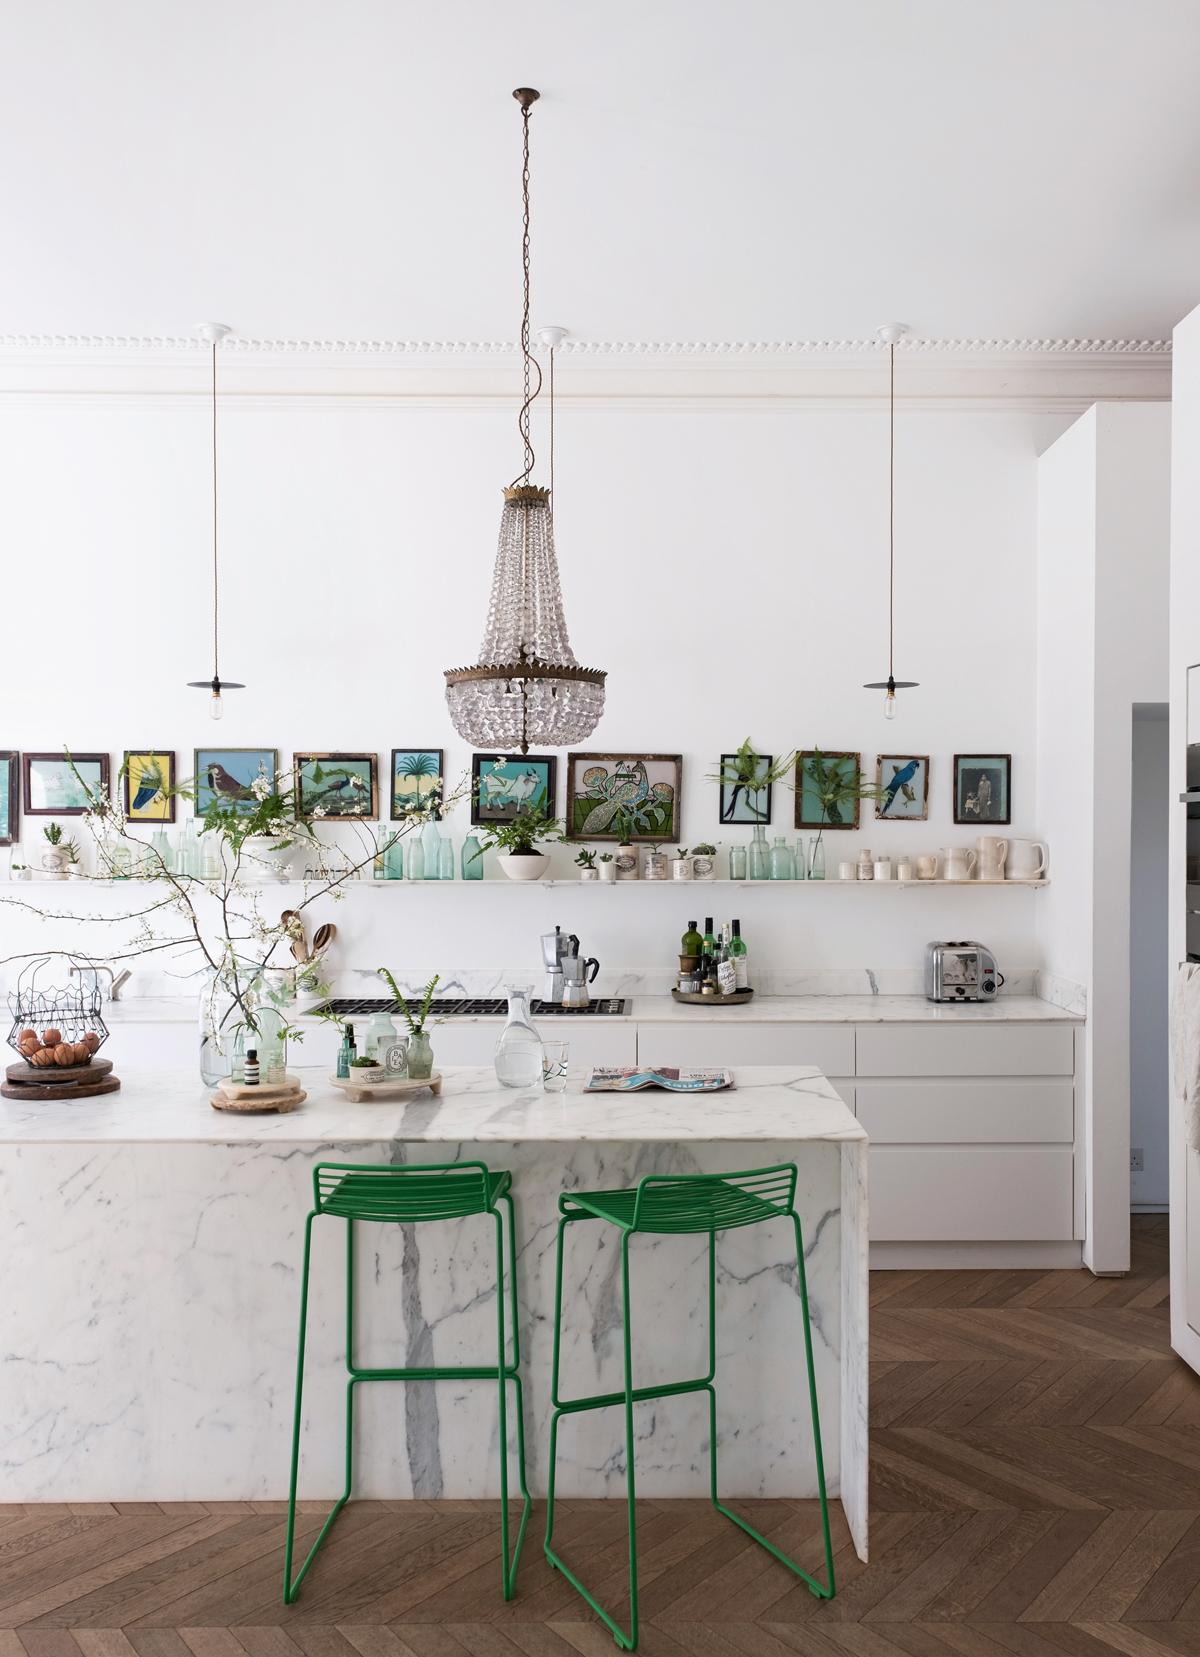 Scandinavian style kitchens: How to create a Scandi kitchen interior